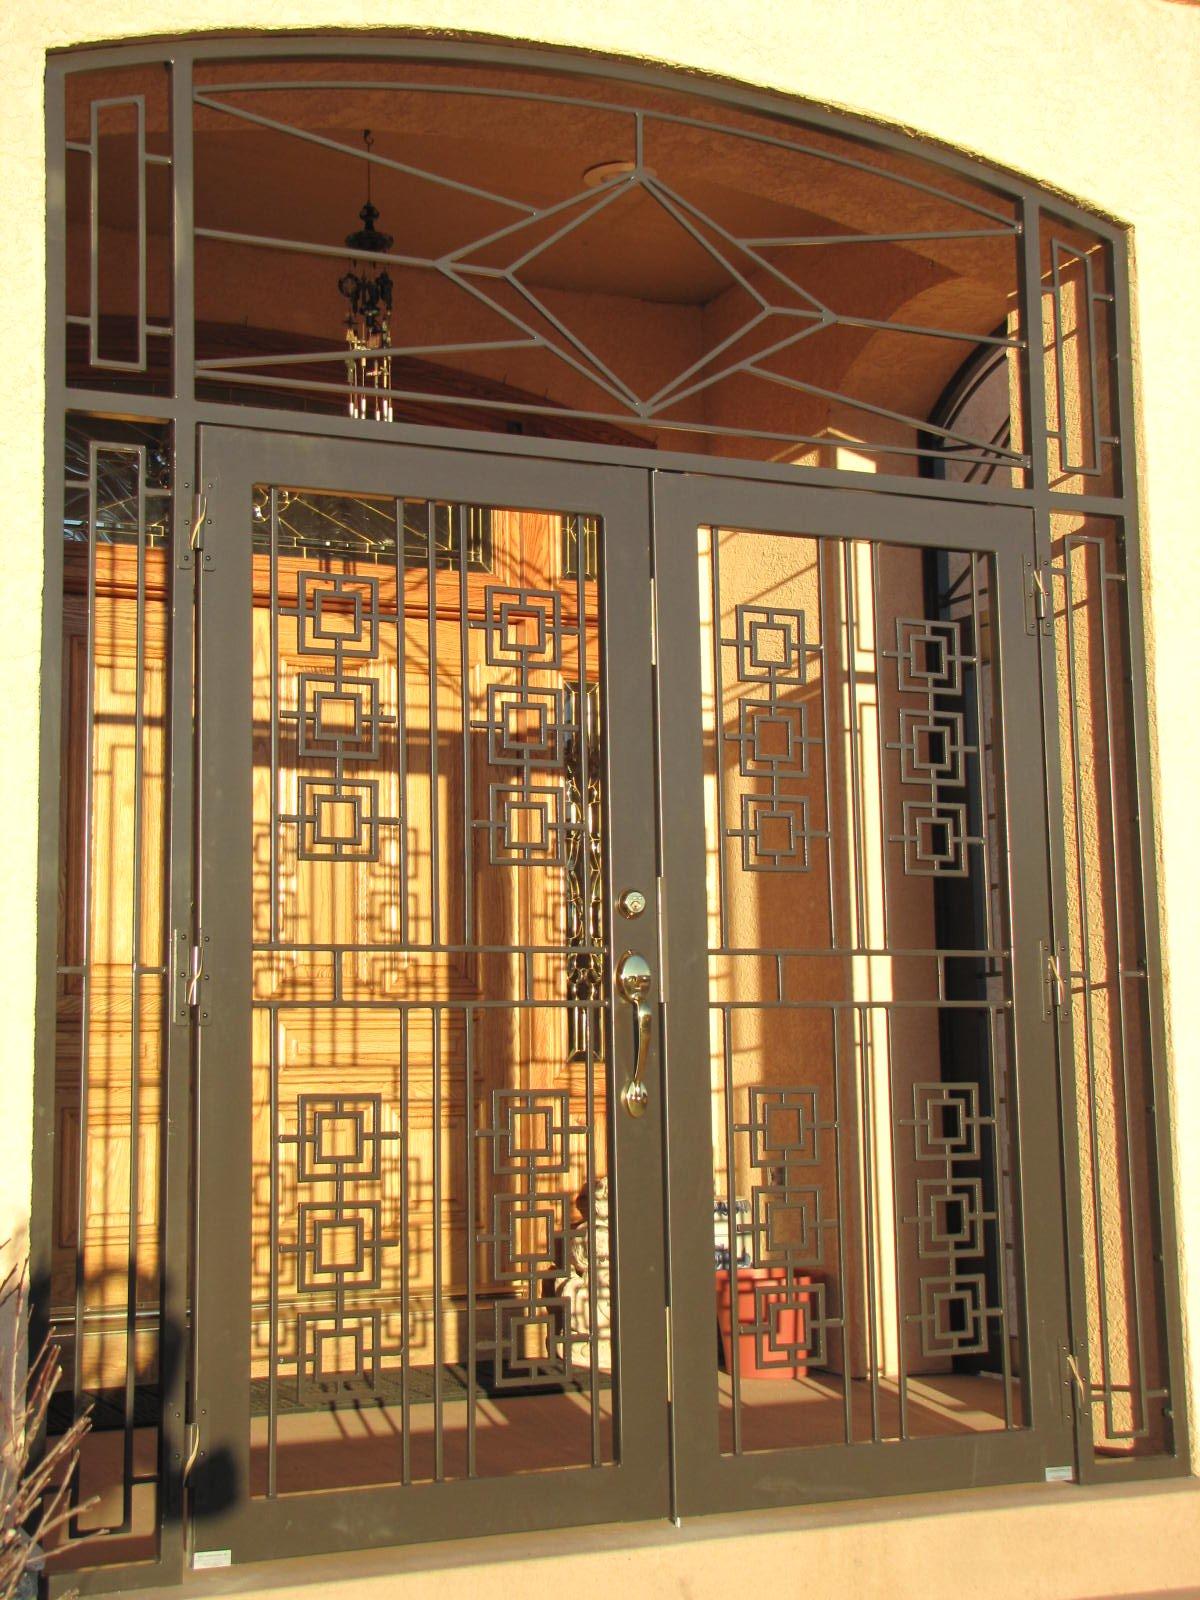 Polintan gates and porch enclosure0006.JPG